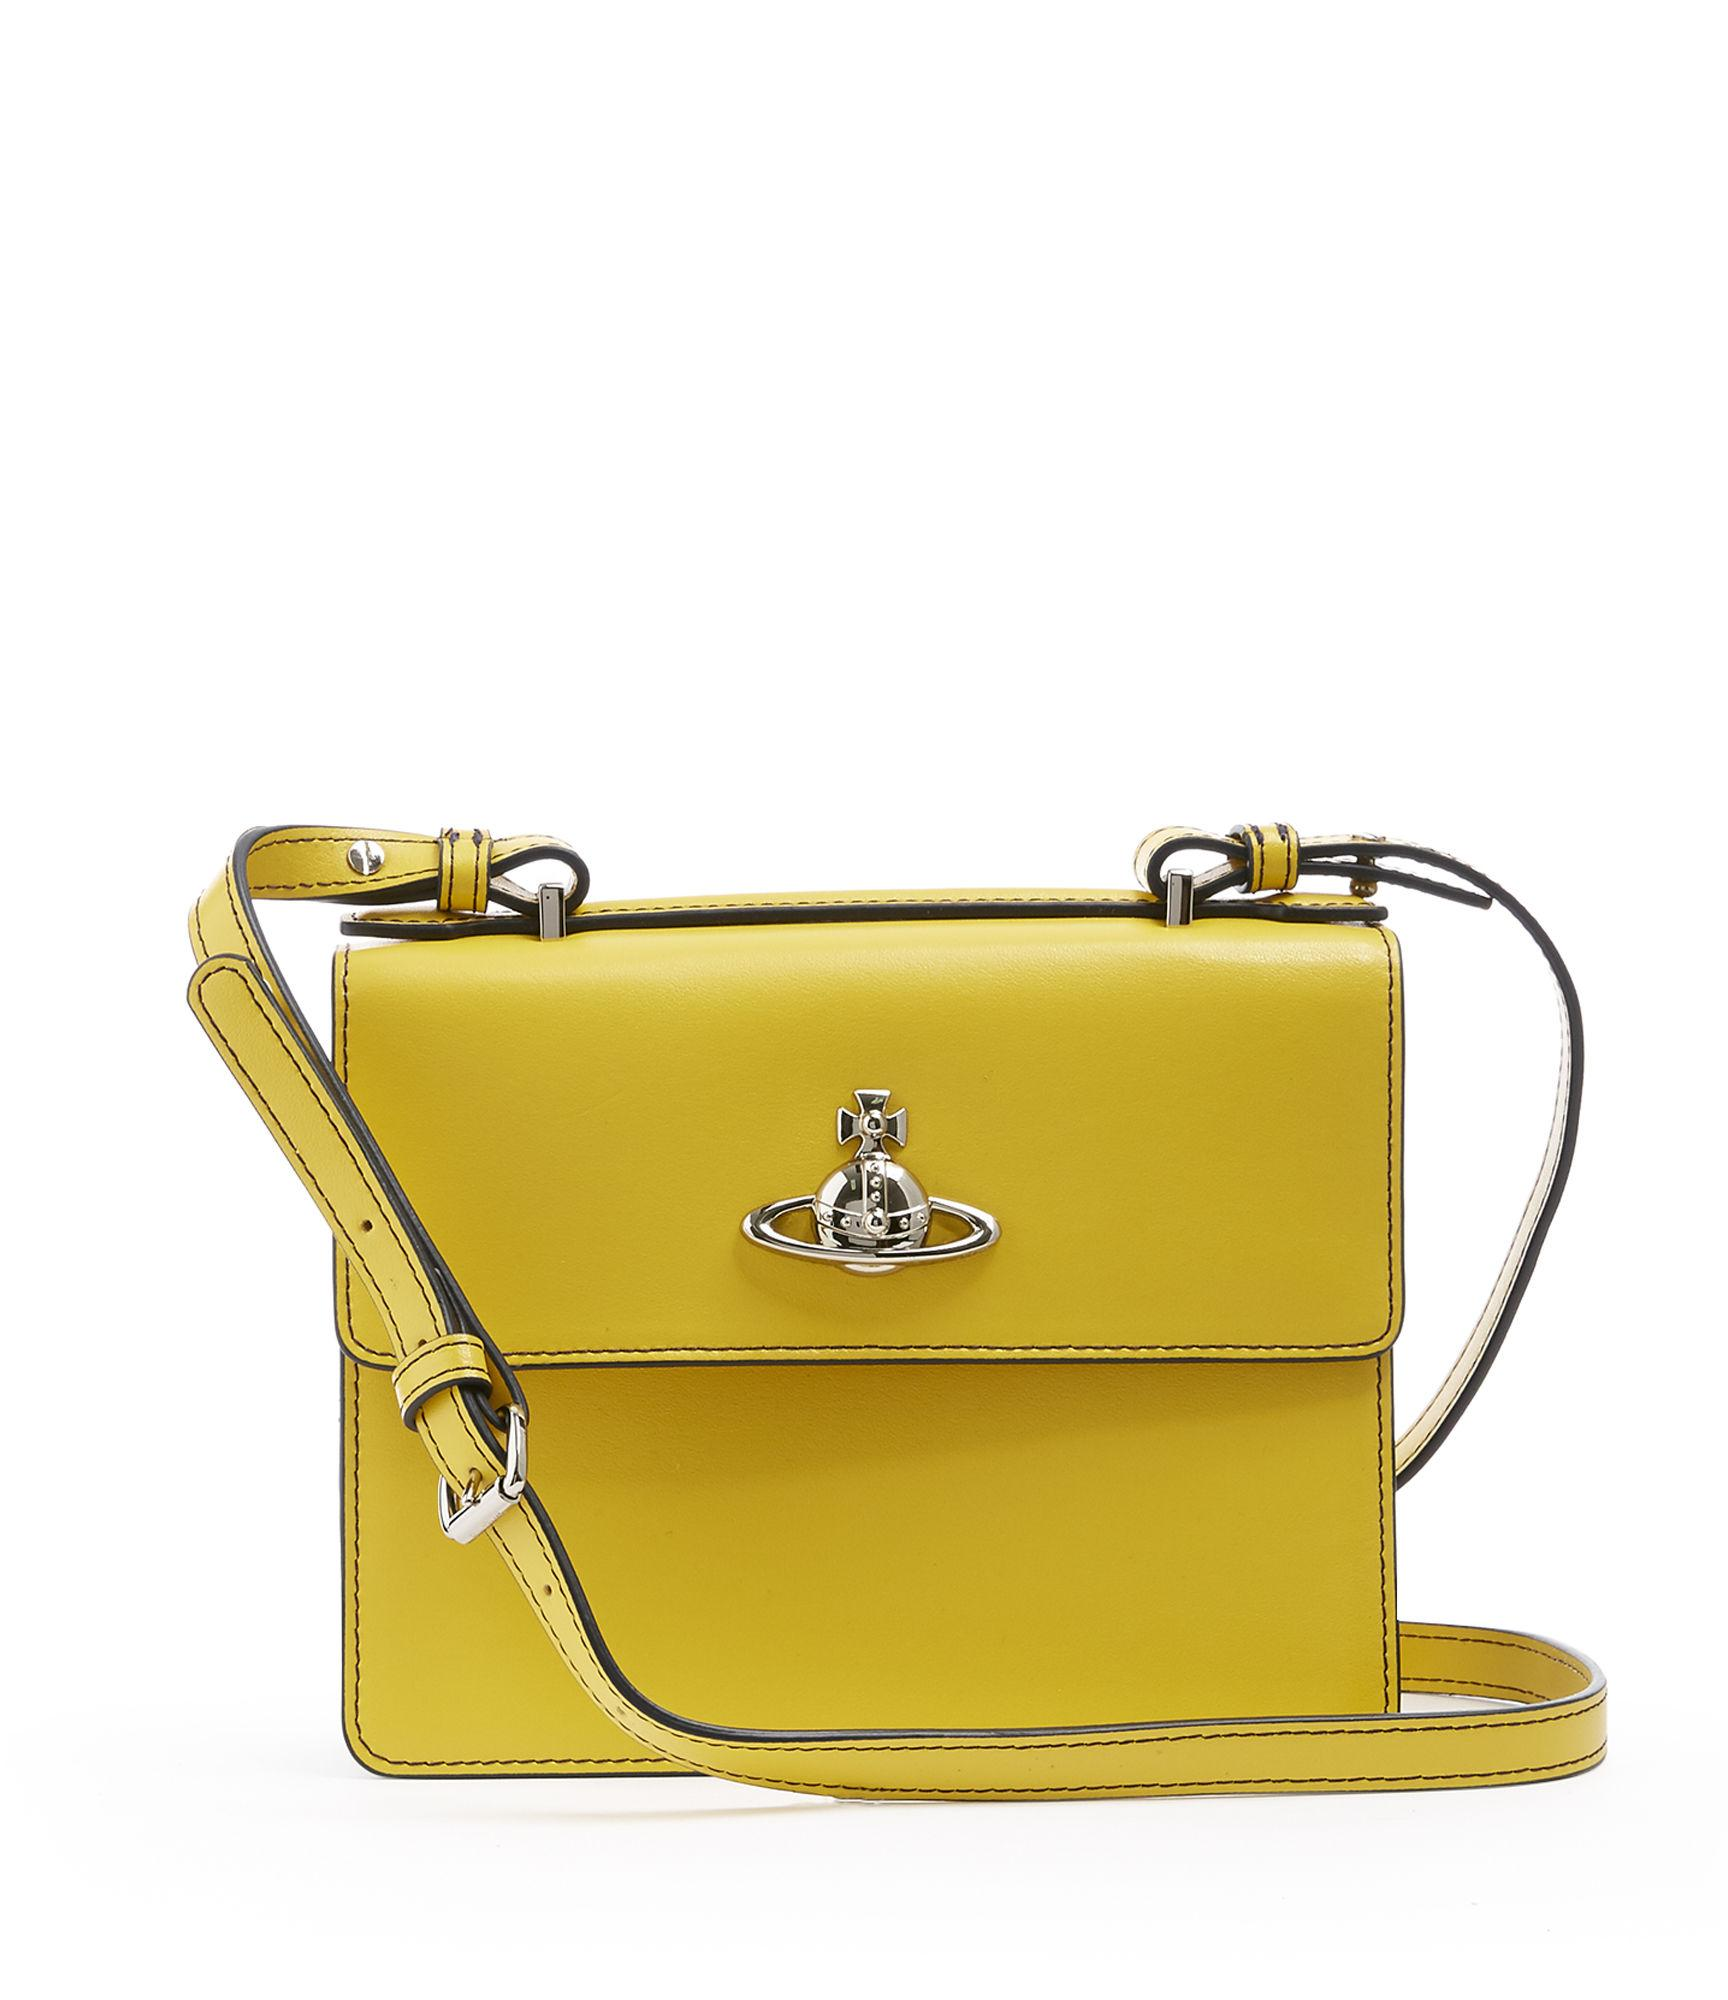 03c8420b91be Vivienne Westwood Matilda Medium Shoulder Bag Yellow | ModeSens